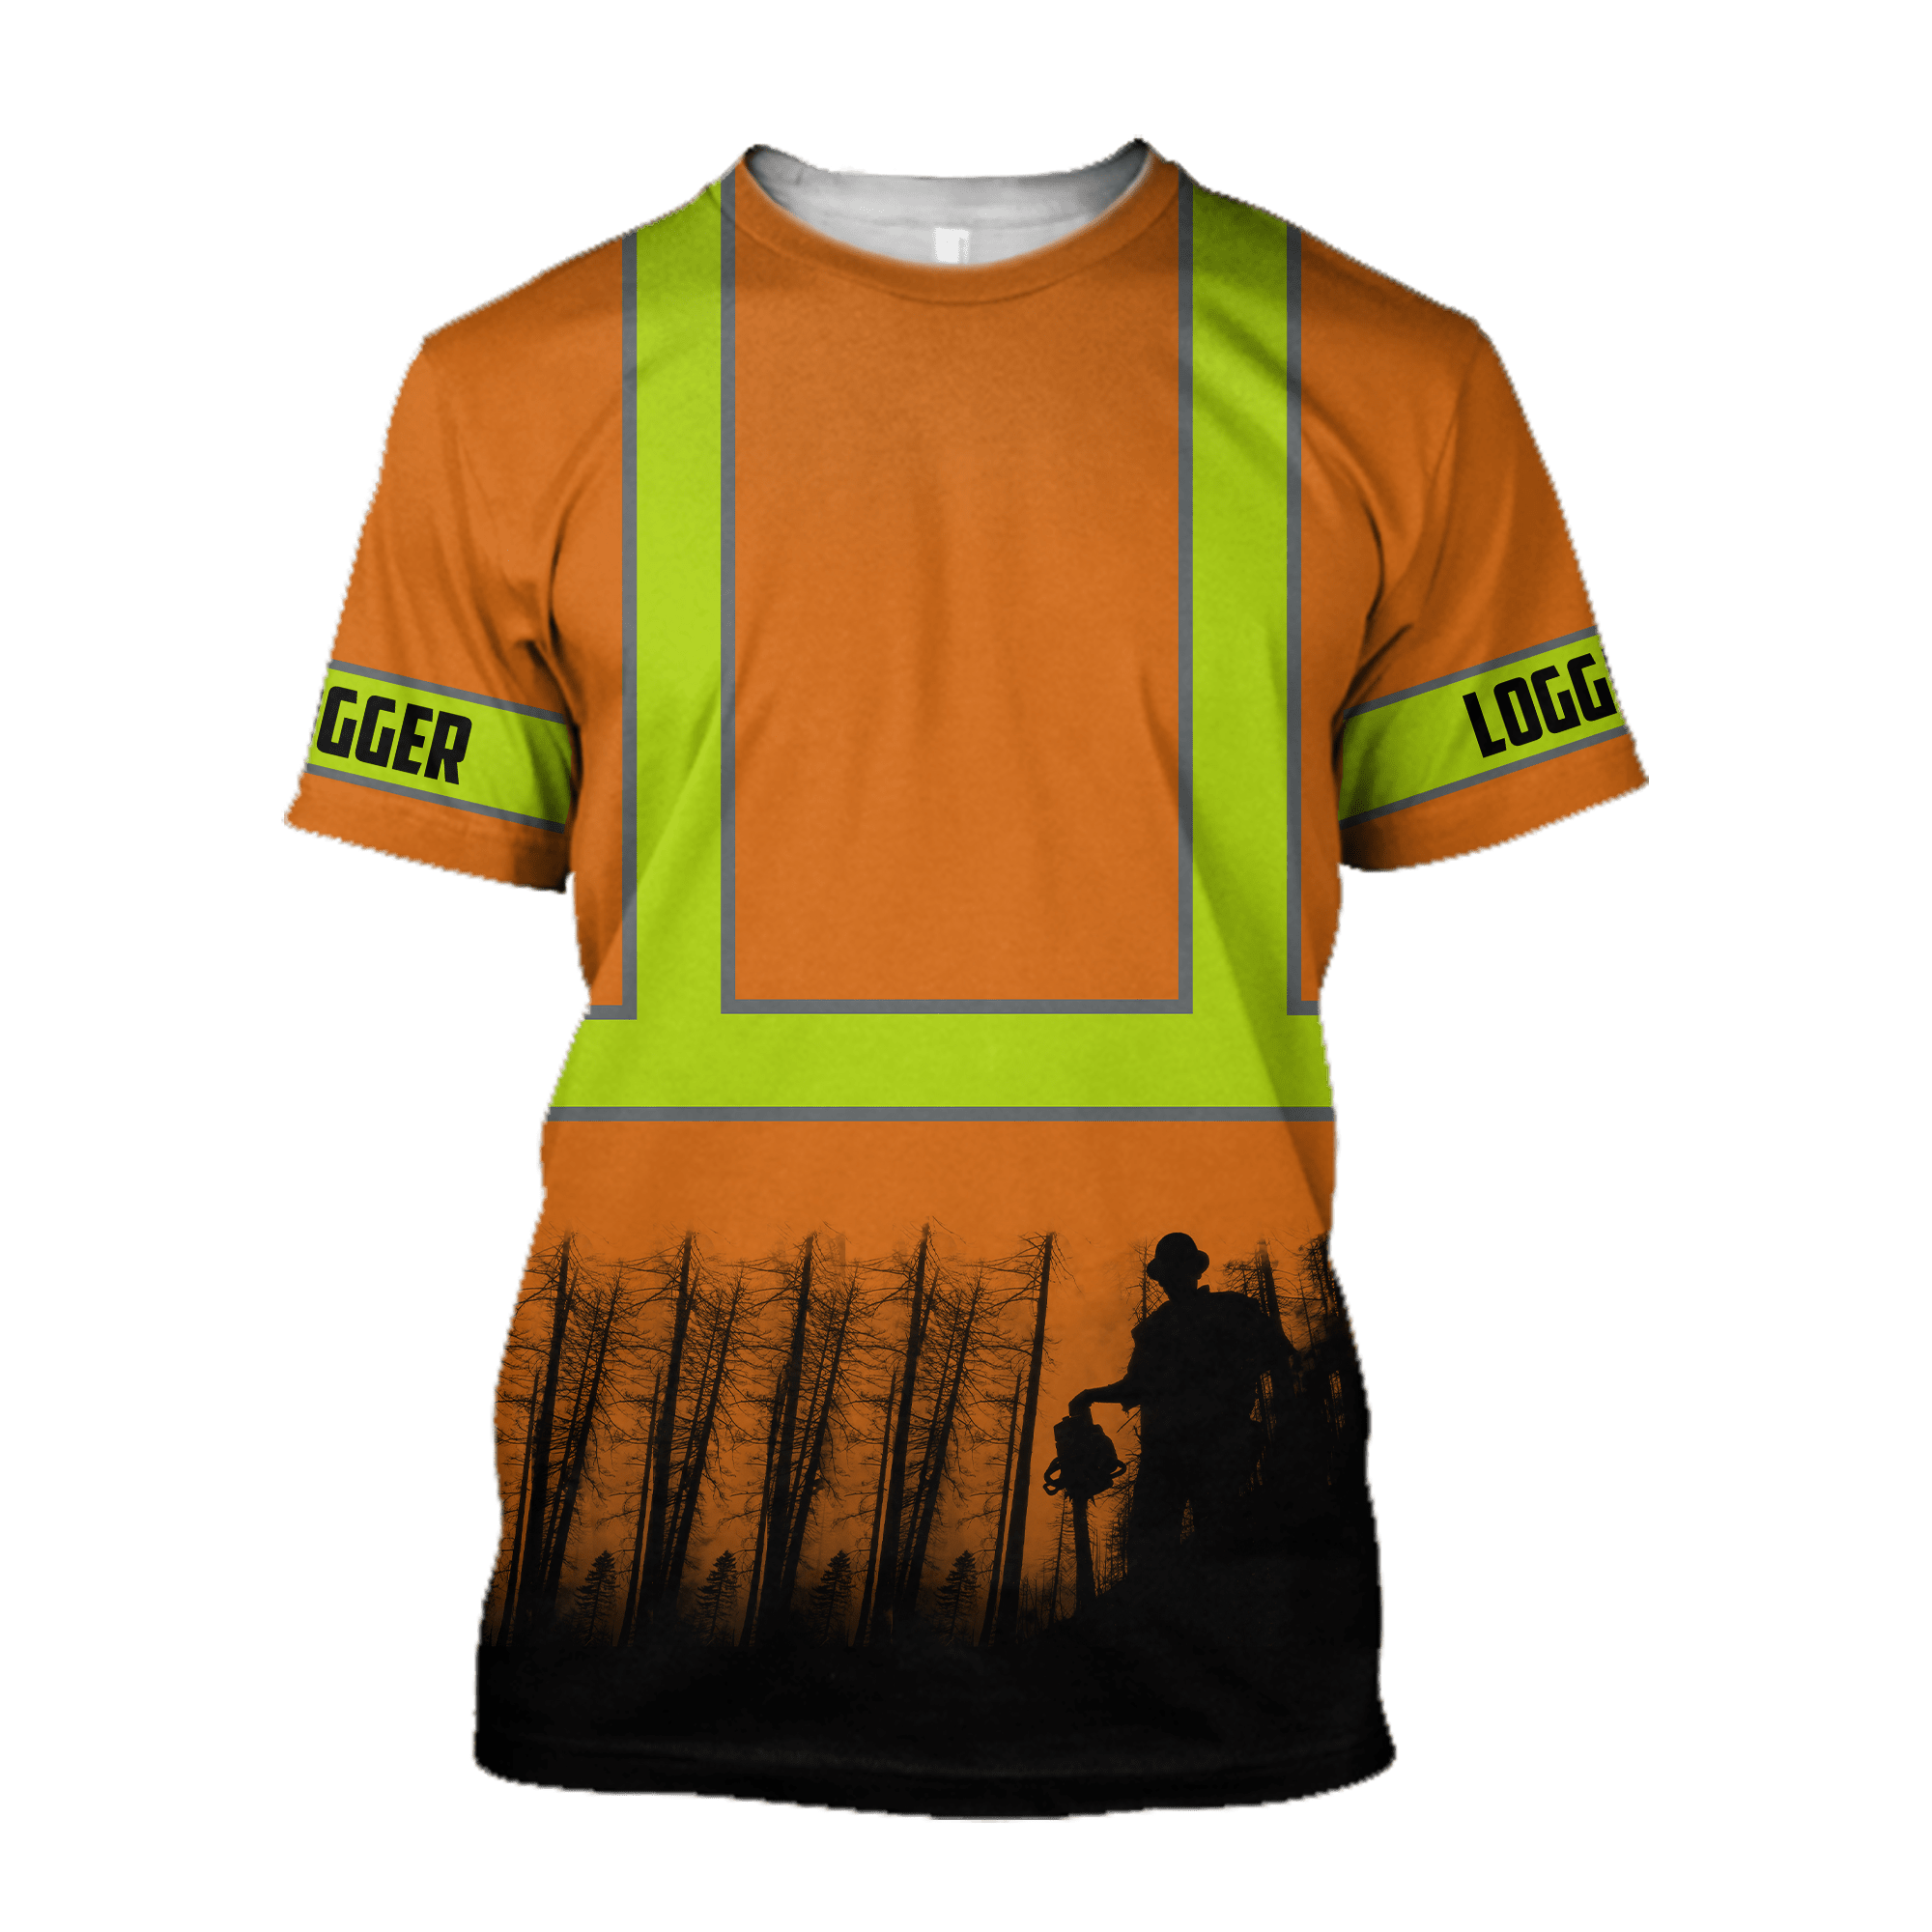 Brave Logger Man Legend Unisex Shirts AM102036 - T-shirt / XL